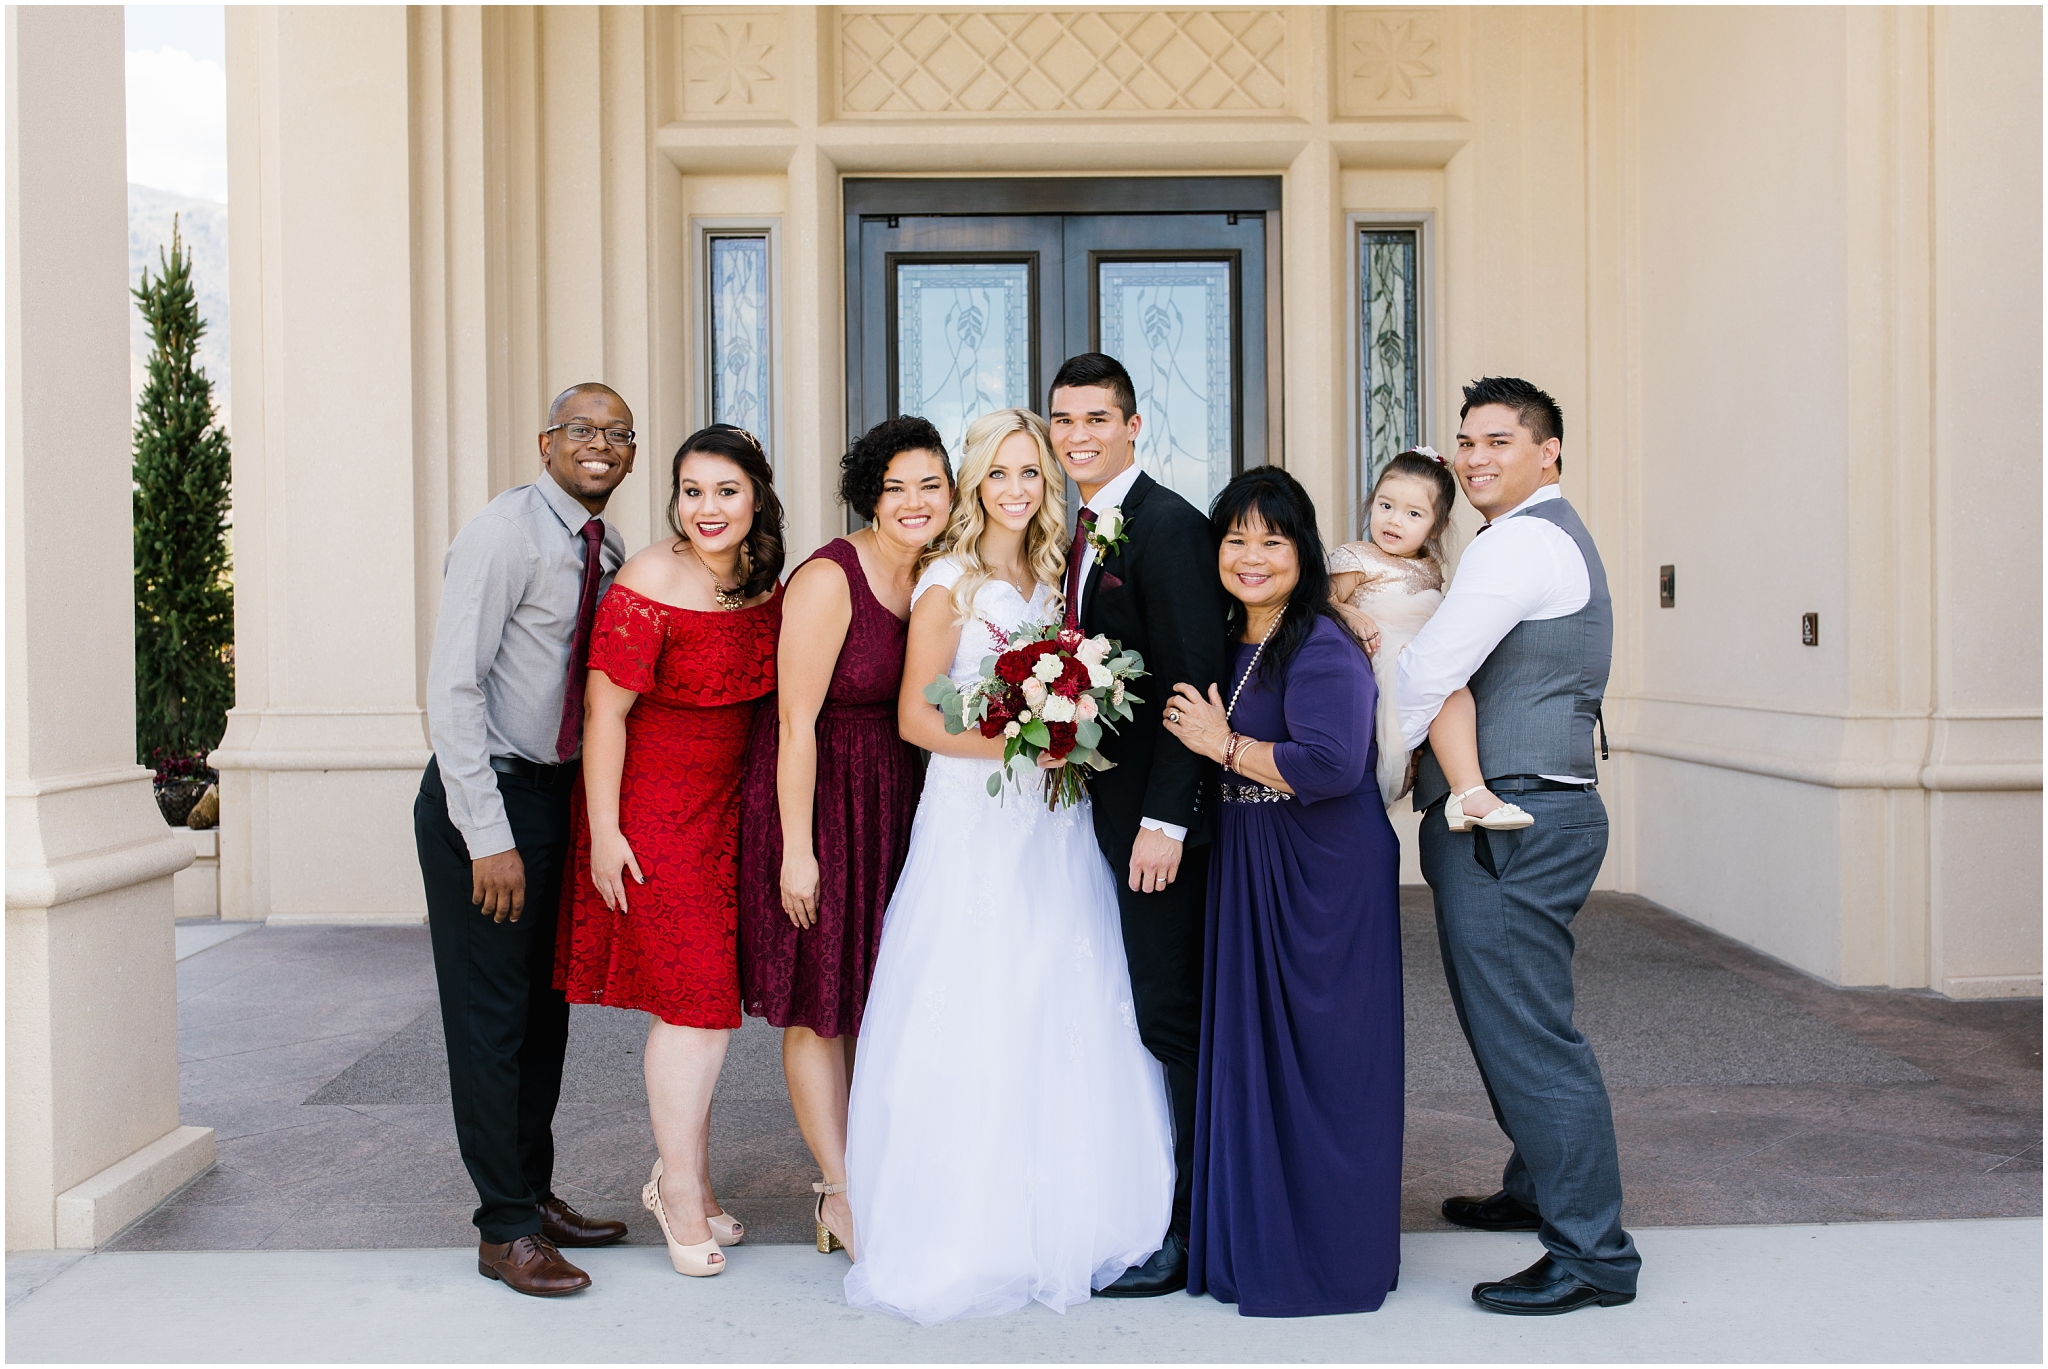 HannahChaseWedding-114_Lizzie-B-Imagery-Utah-Wedding-Photographer-Park-City-Salt-Lake-City-Payson-Temple-Clarion-Garden-Center.jpg